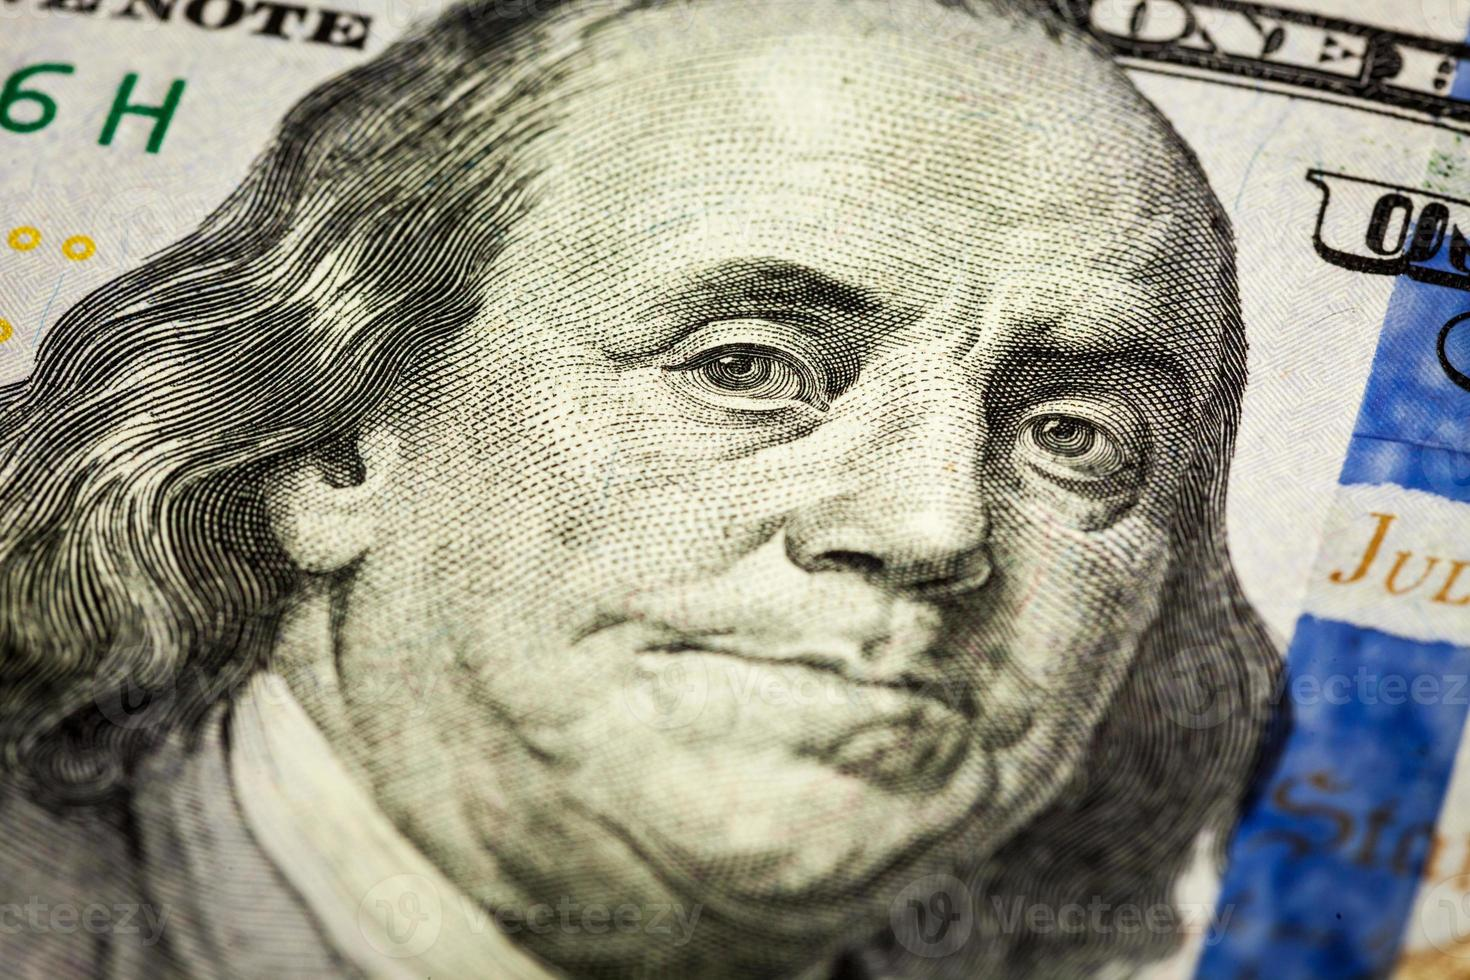 Benjamin Franklin portret macro-opname van 100 factuur foto